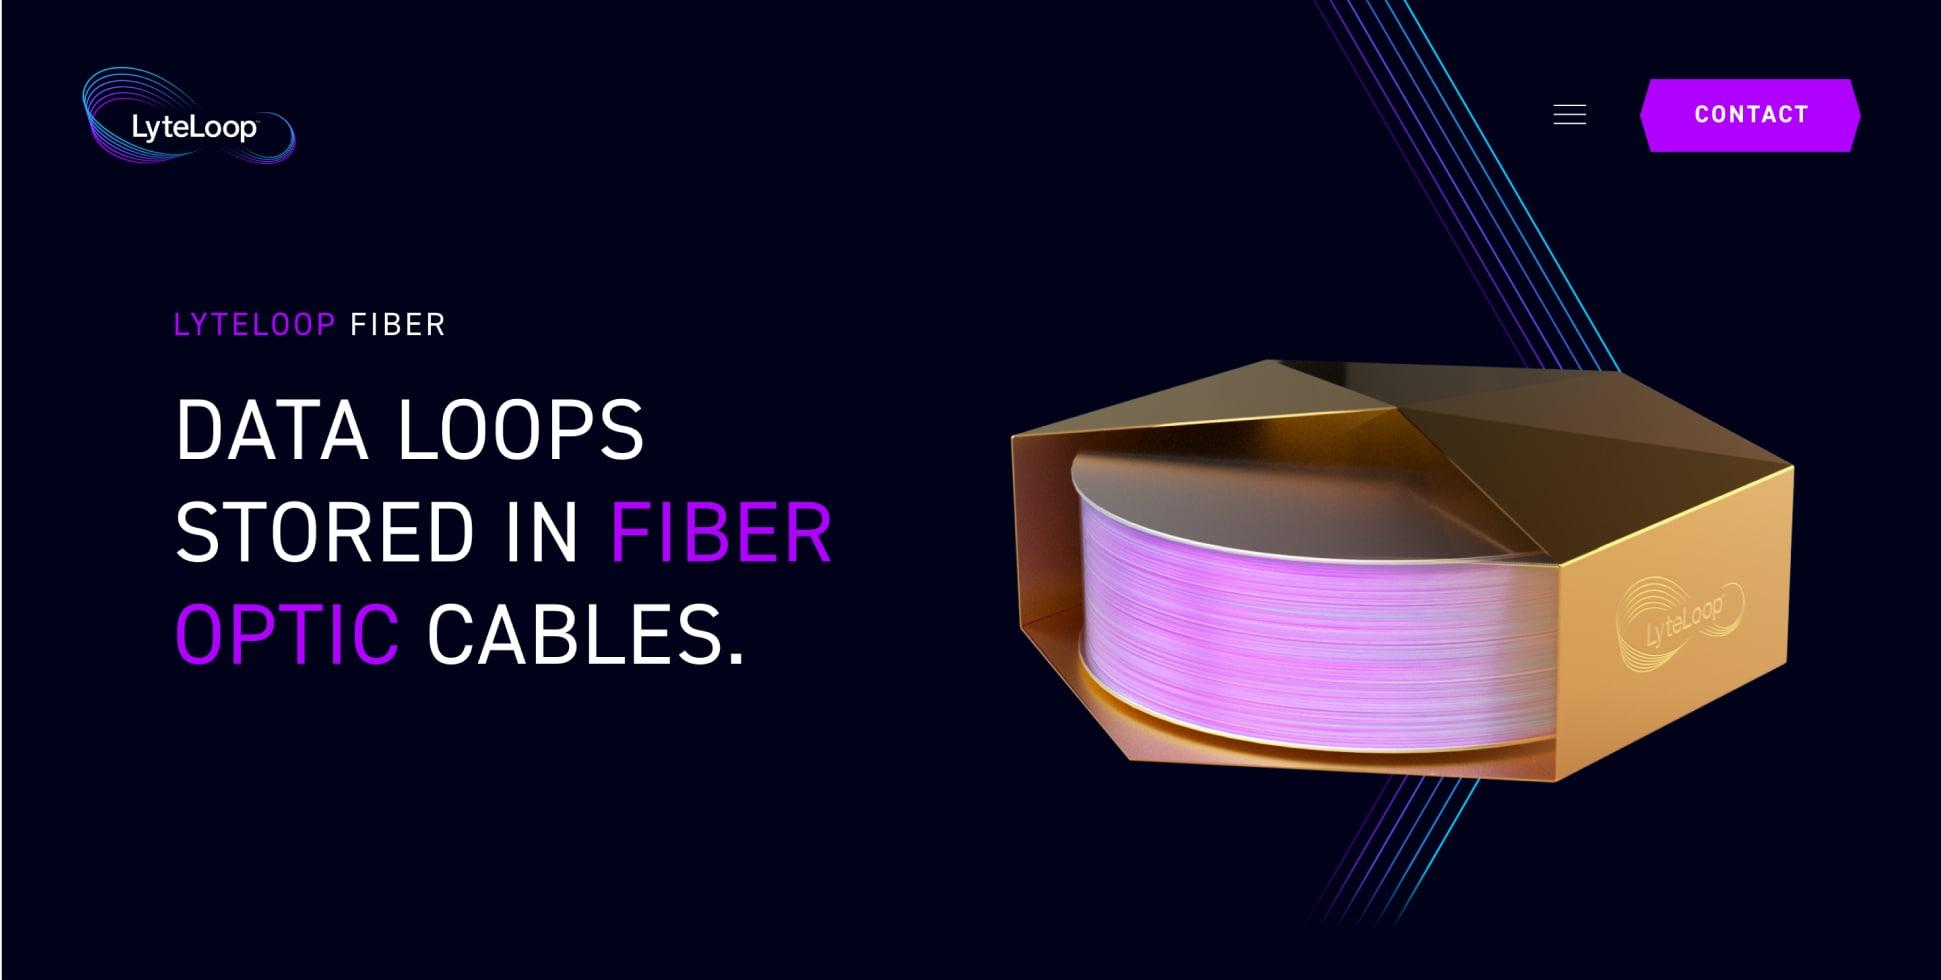 Slide 4: LyteLoop Fiber